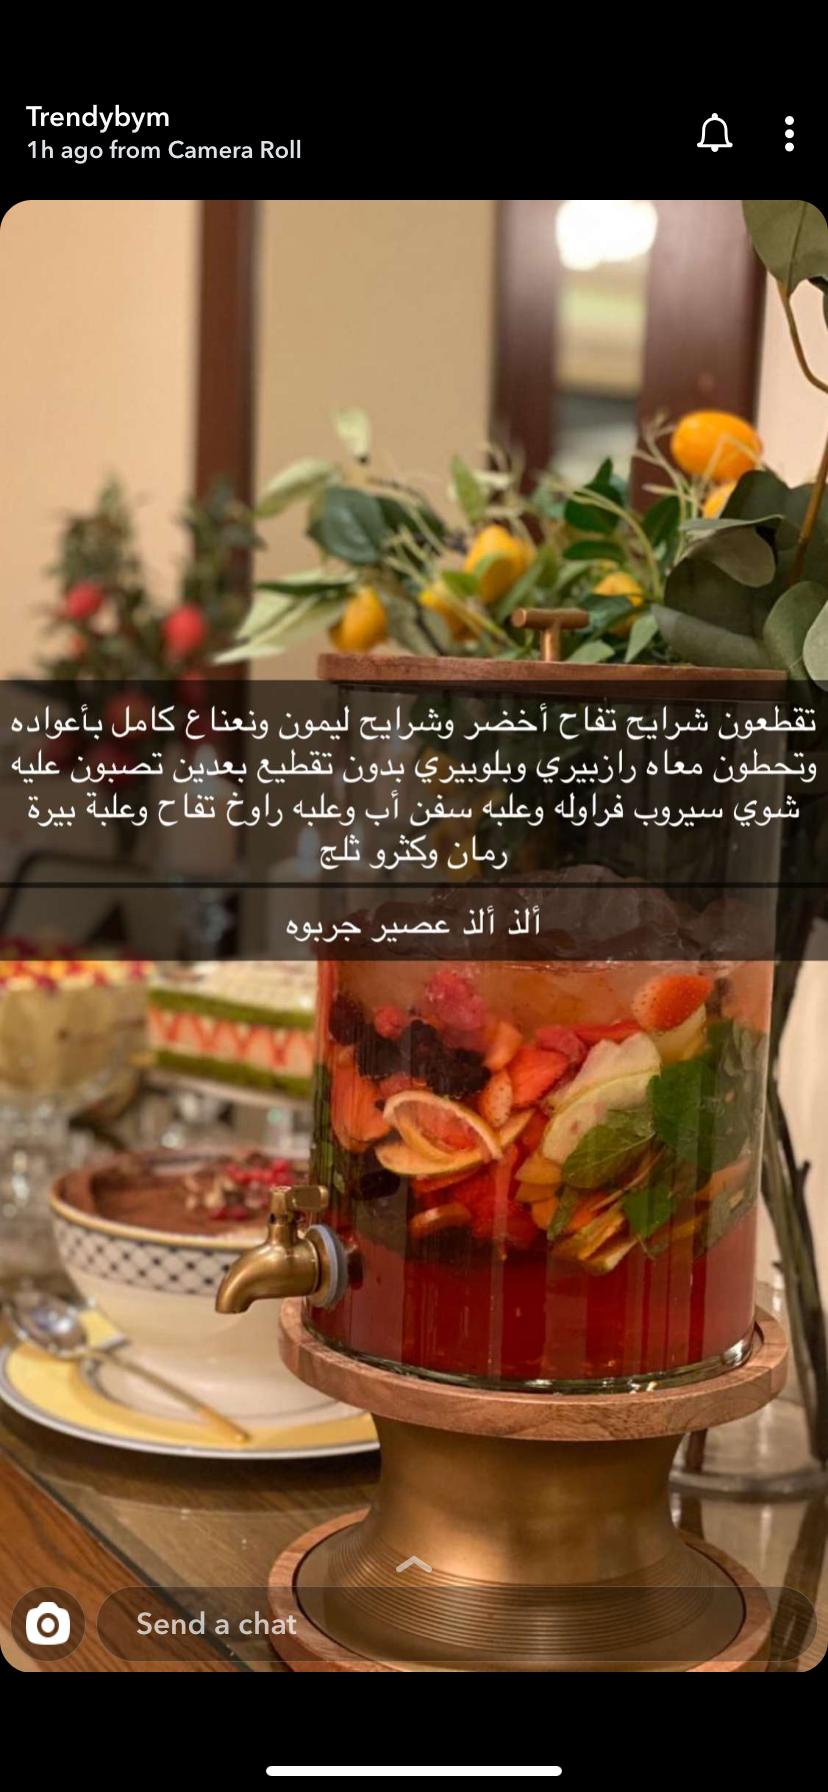 Pin By Dodi On وصفات من كل بلدان العربية Healthy Drinks Recipes Cookout Food Food Receipes